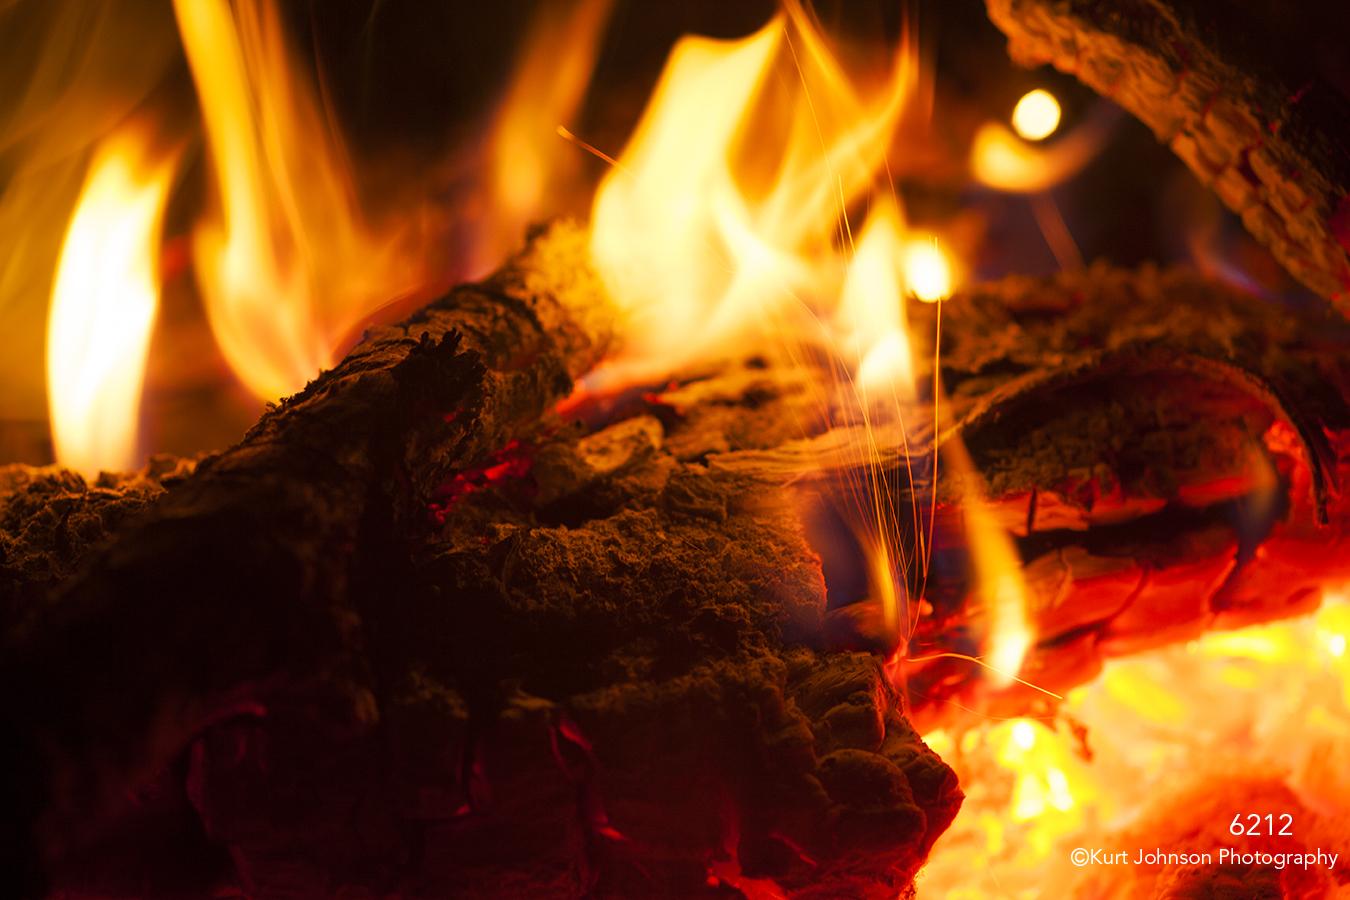 texture fire wood burning red brown orange